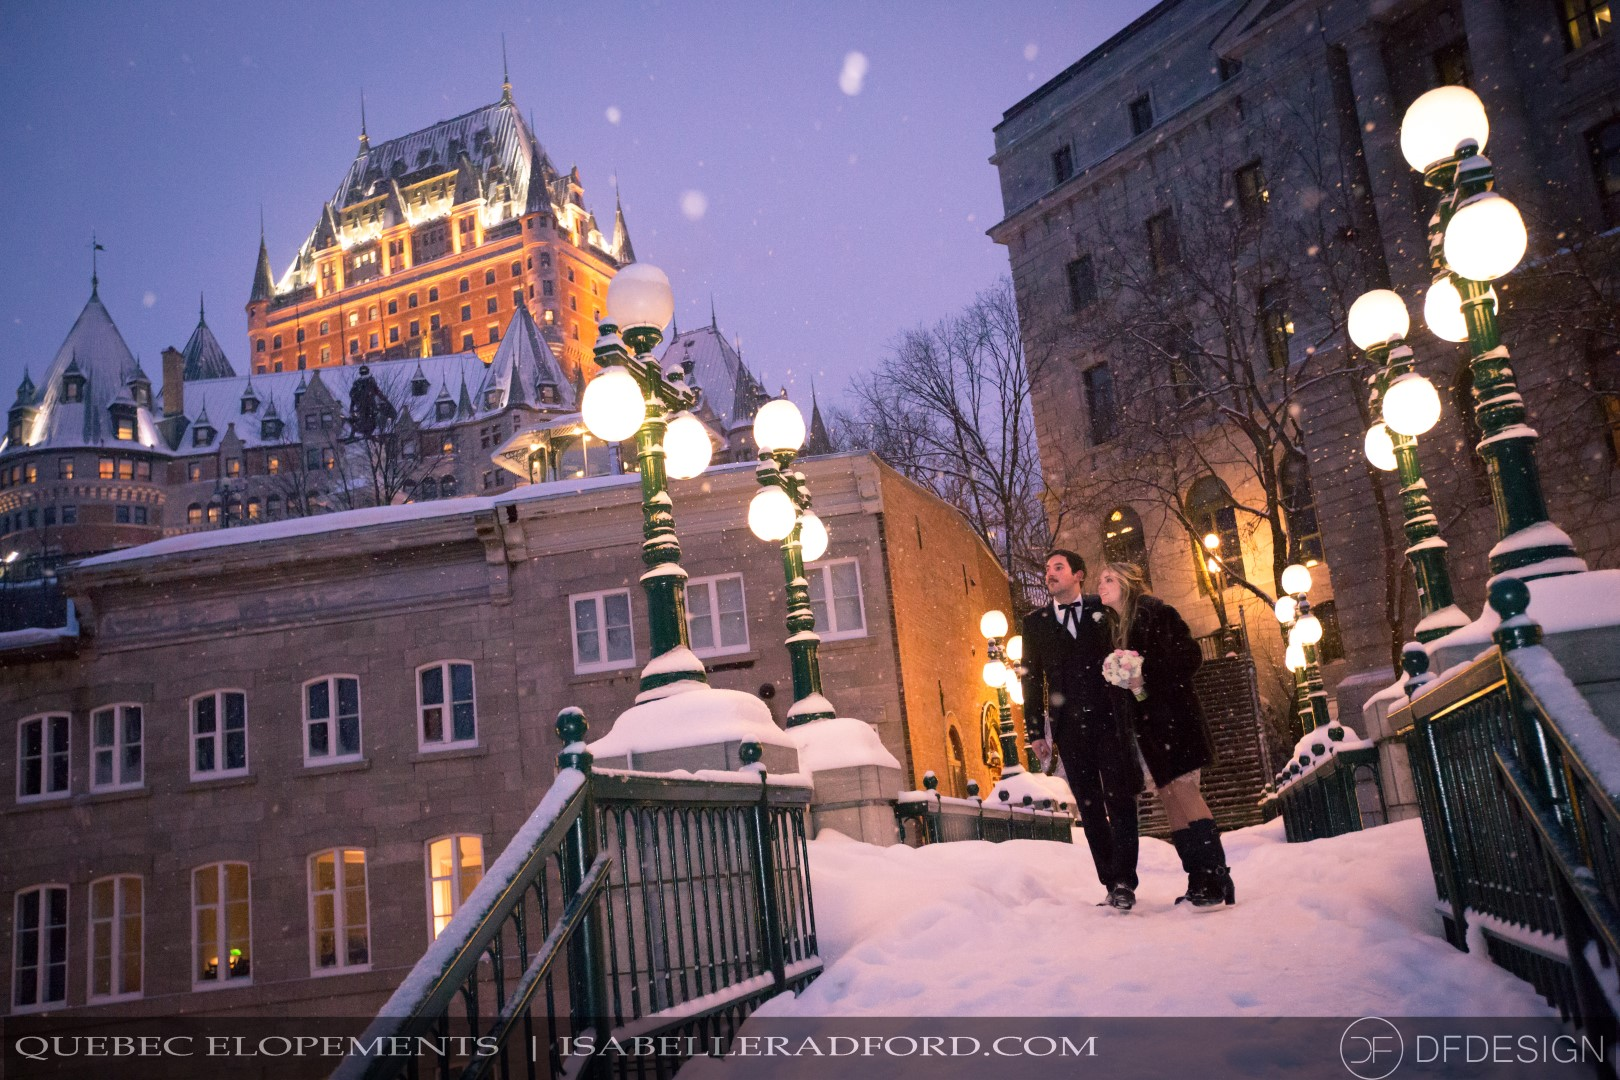 Mariages Intimes - Quebec Elopements